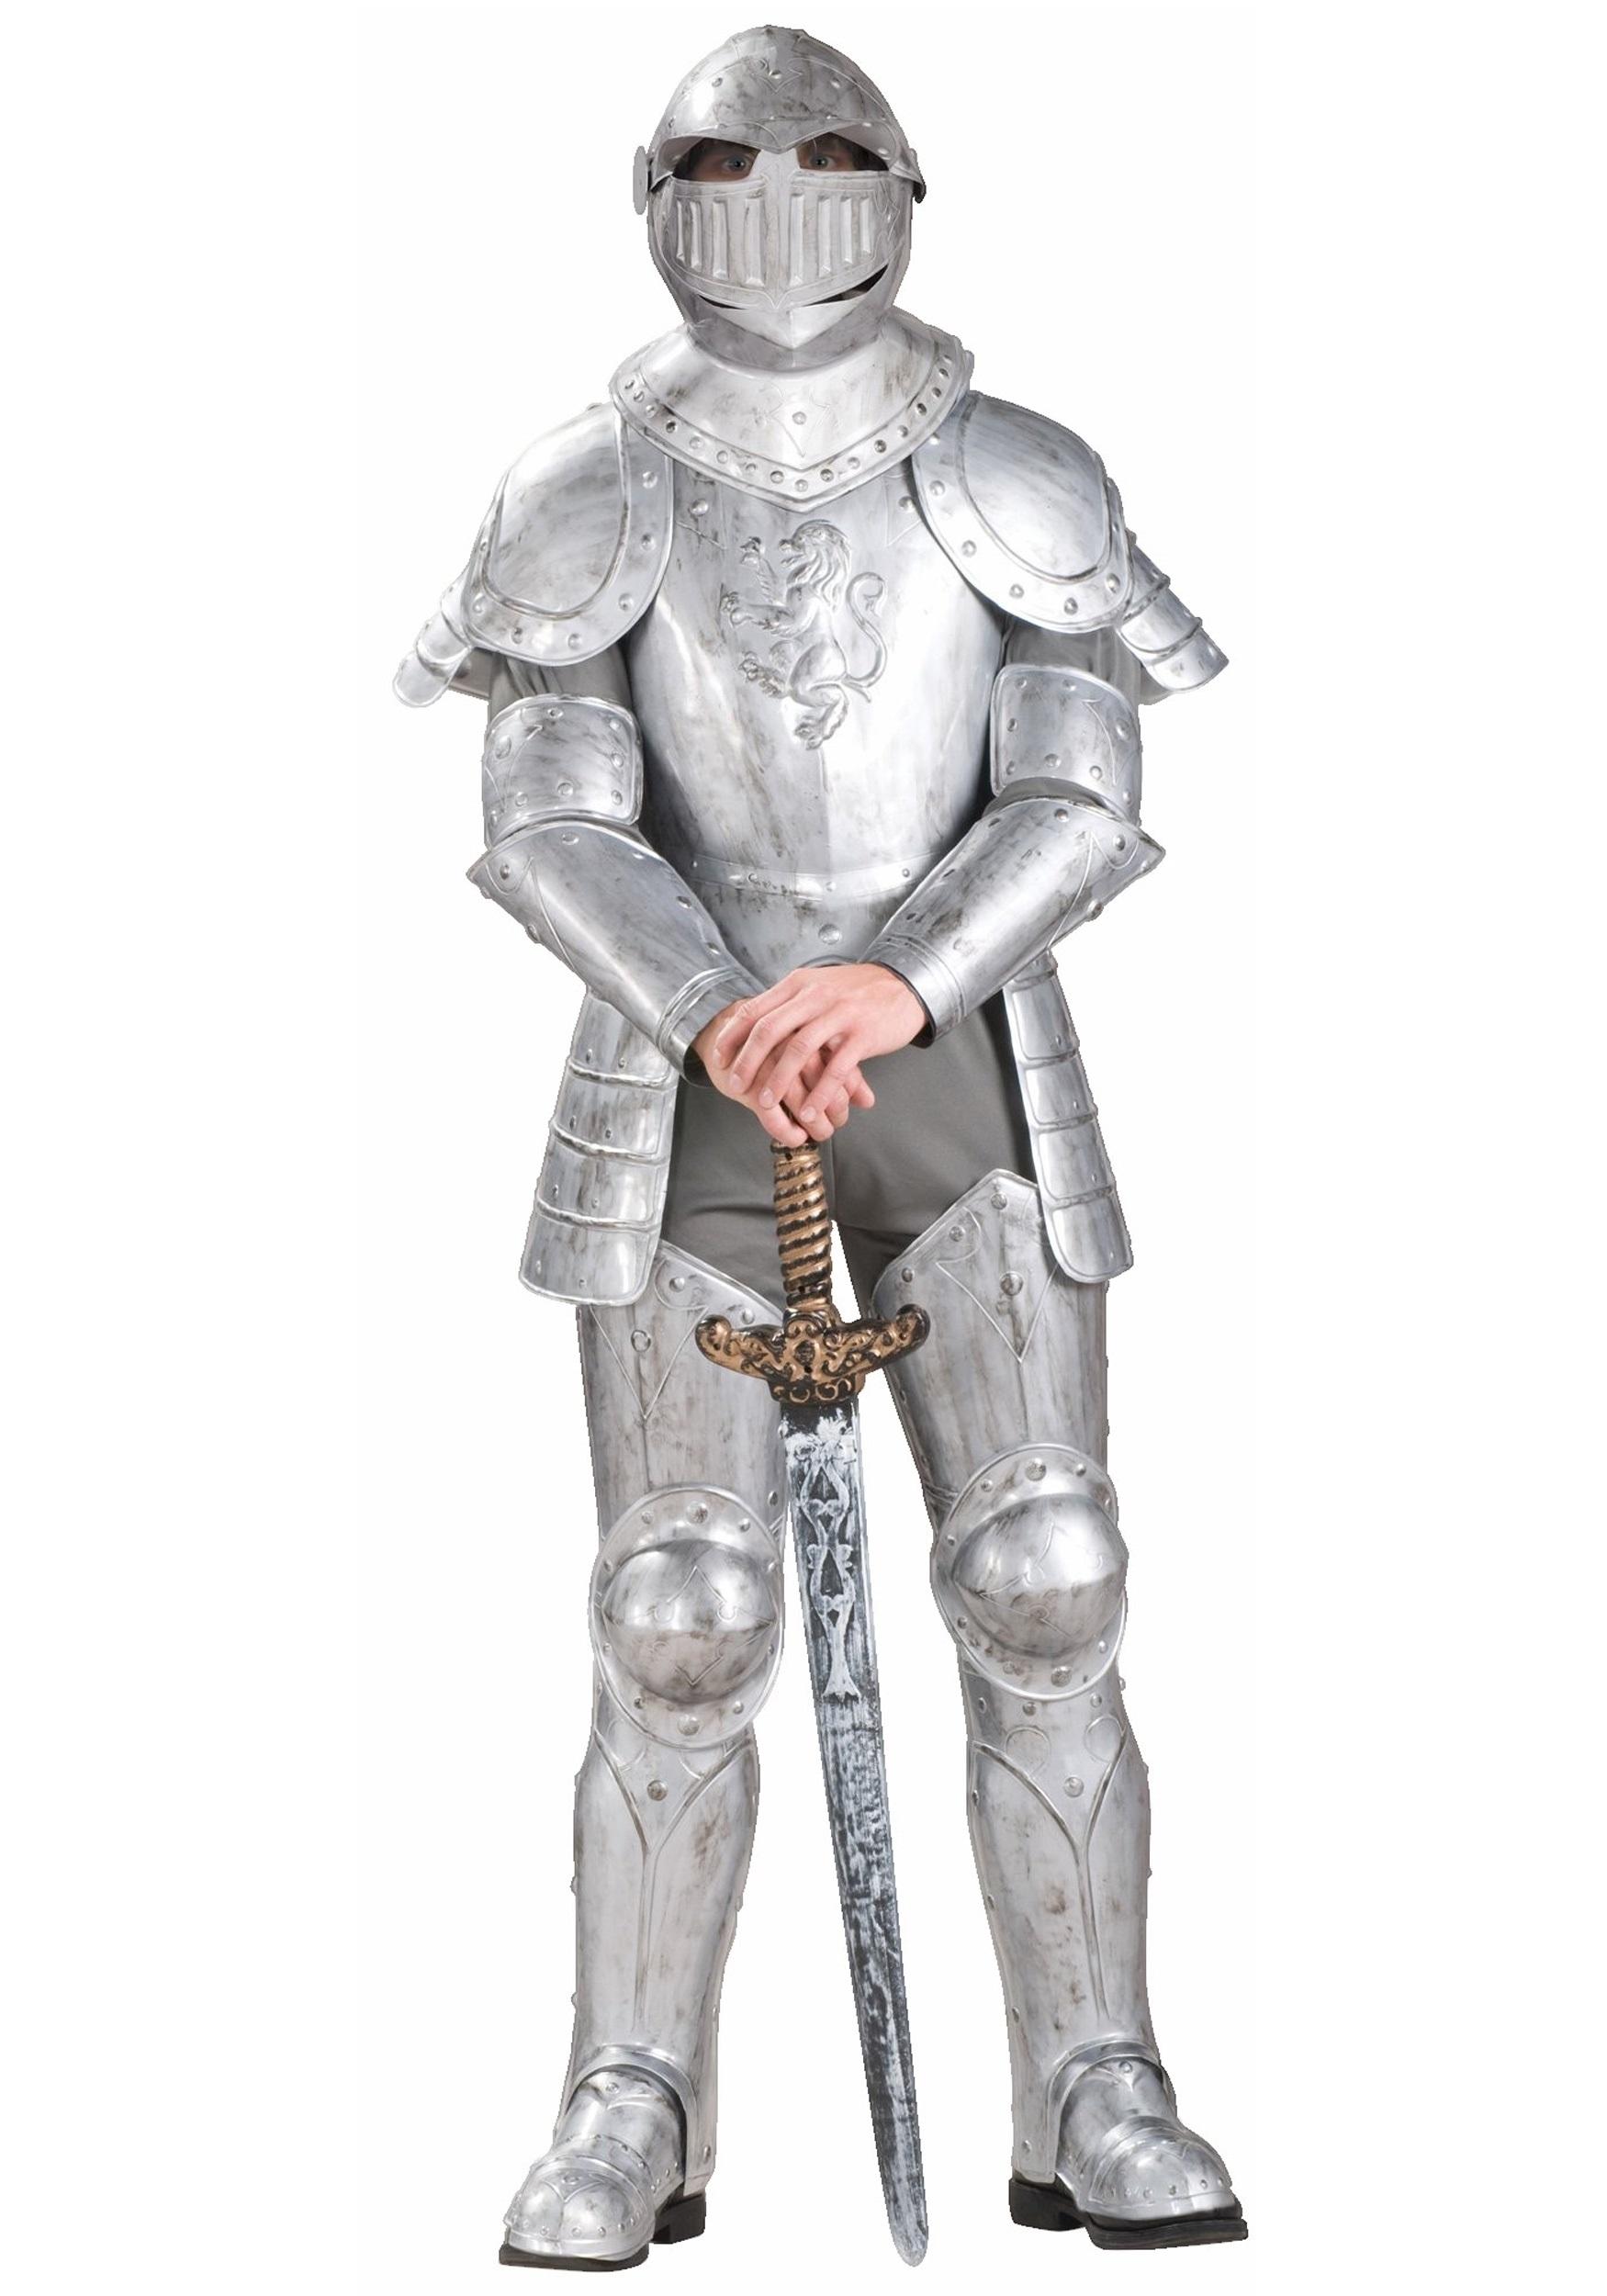 Plastic Arm Guards